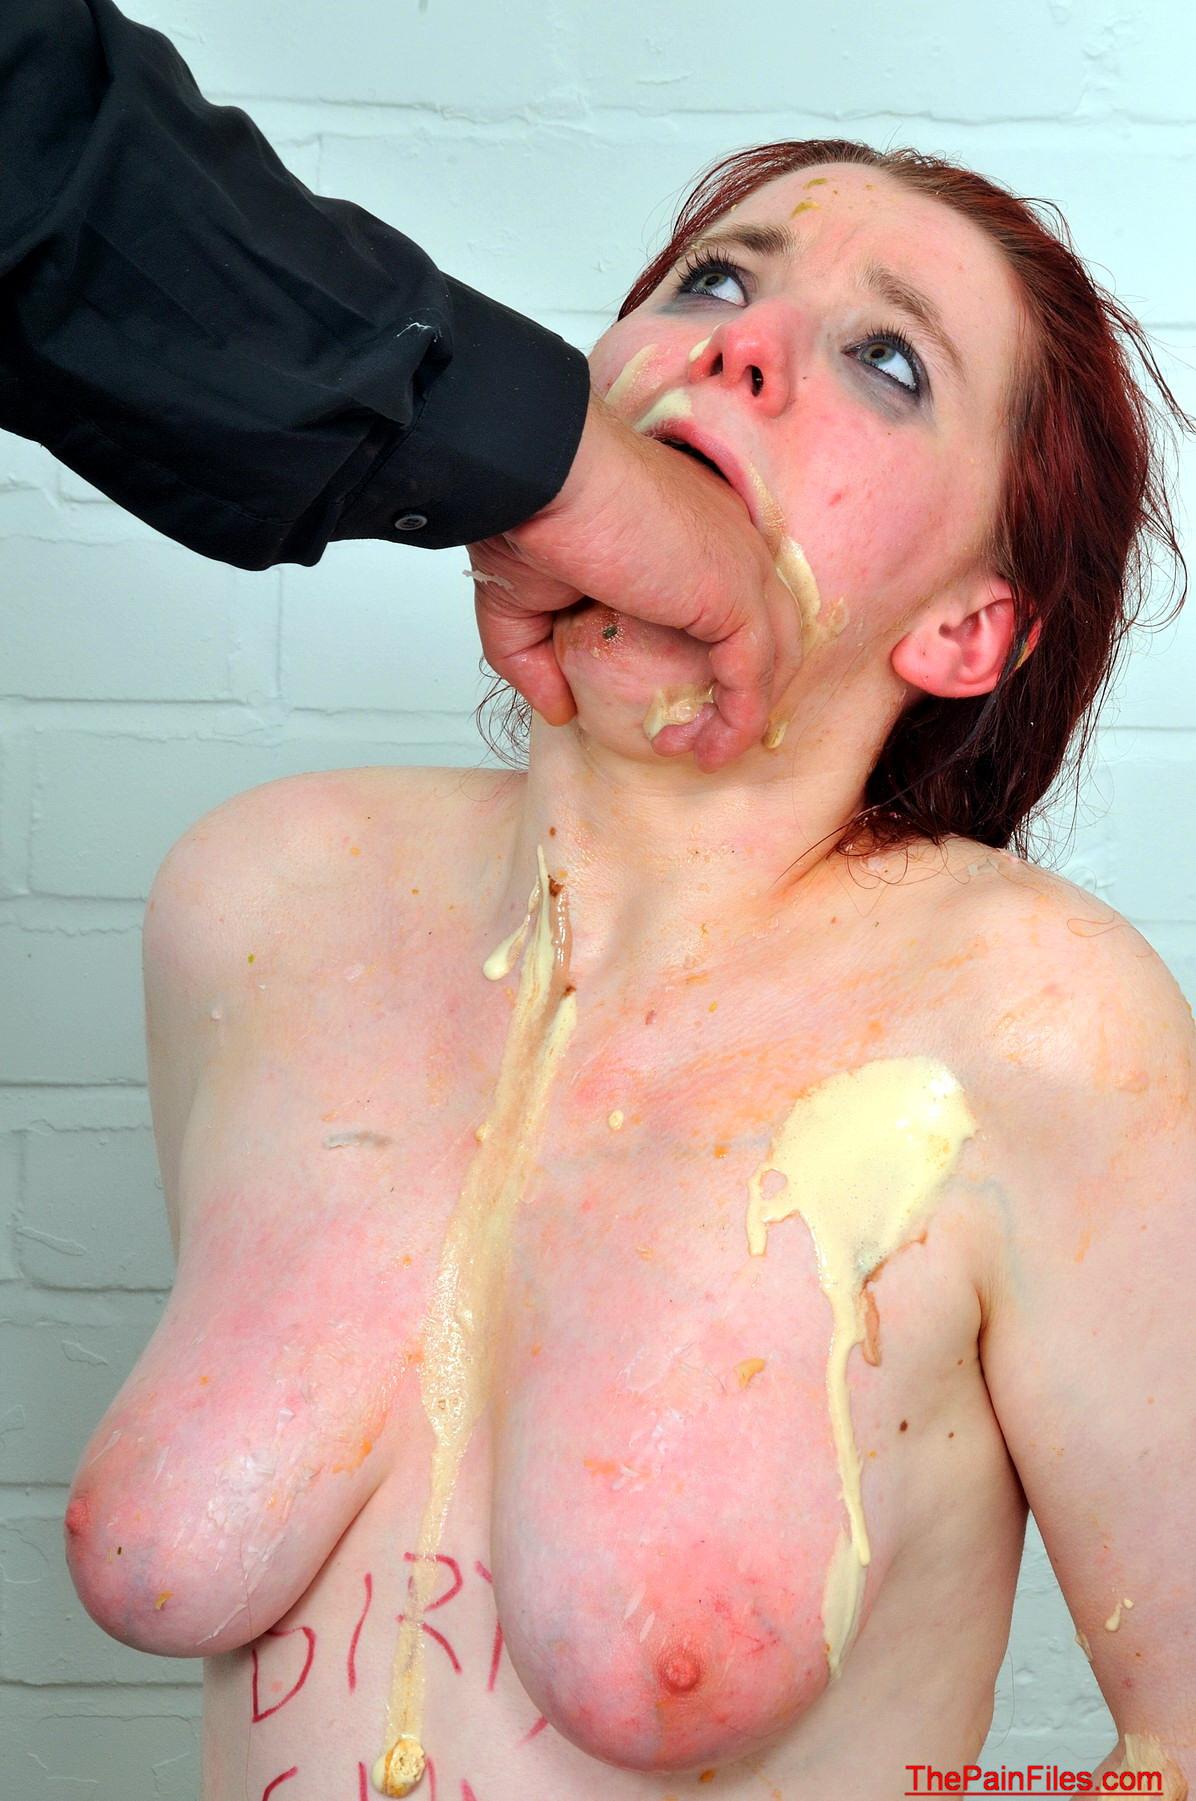 This Female slut humiliation love there